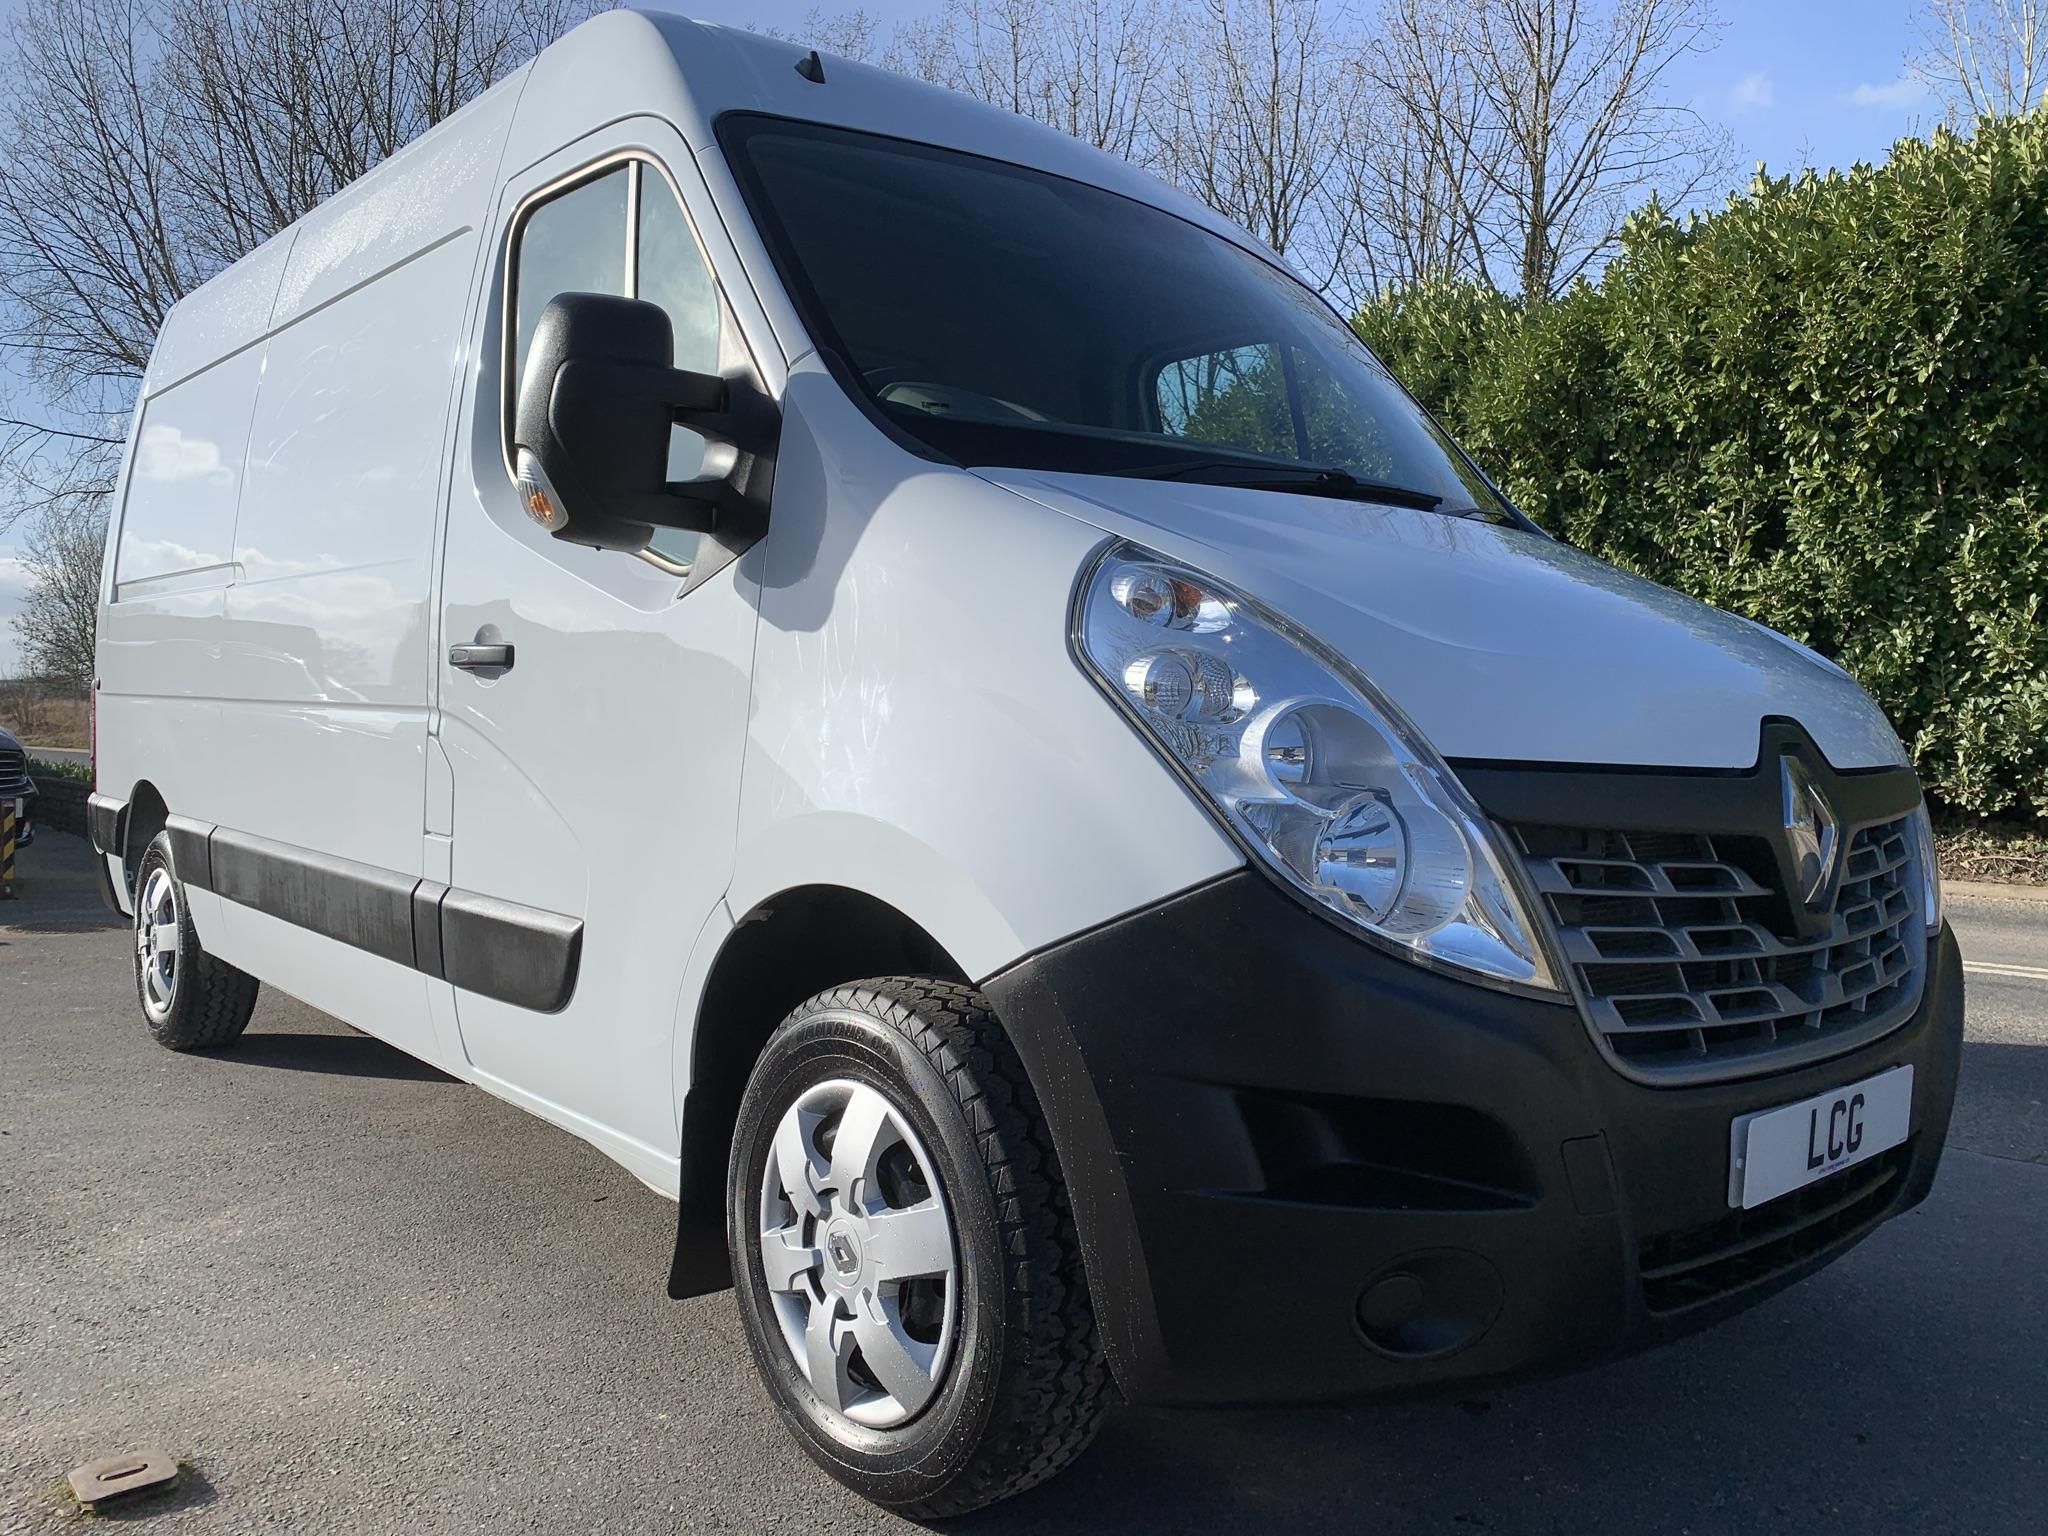 Used Renault Master MM35 145 Business+ Energy Panel Van van for sale in Exeter, Devon